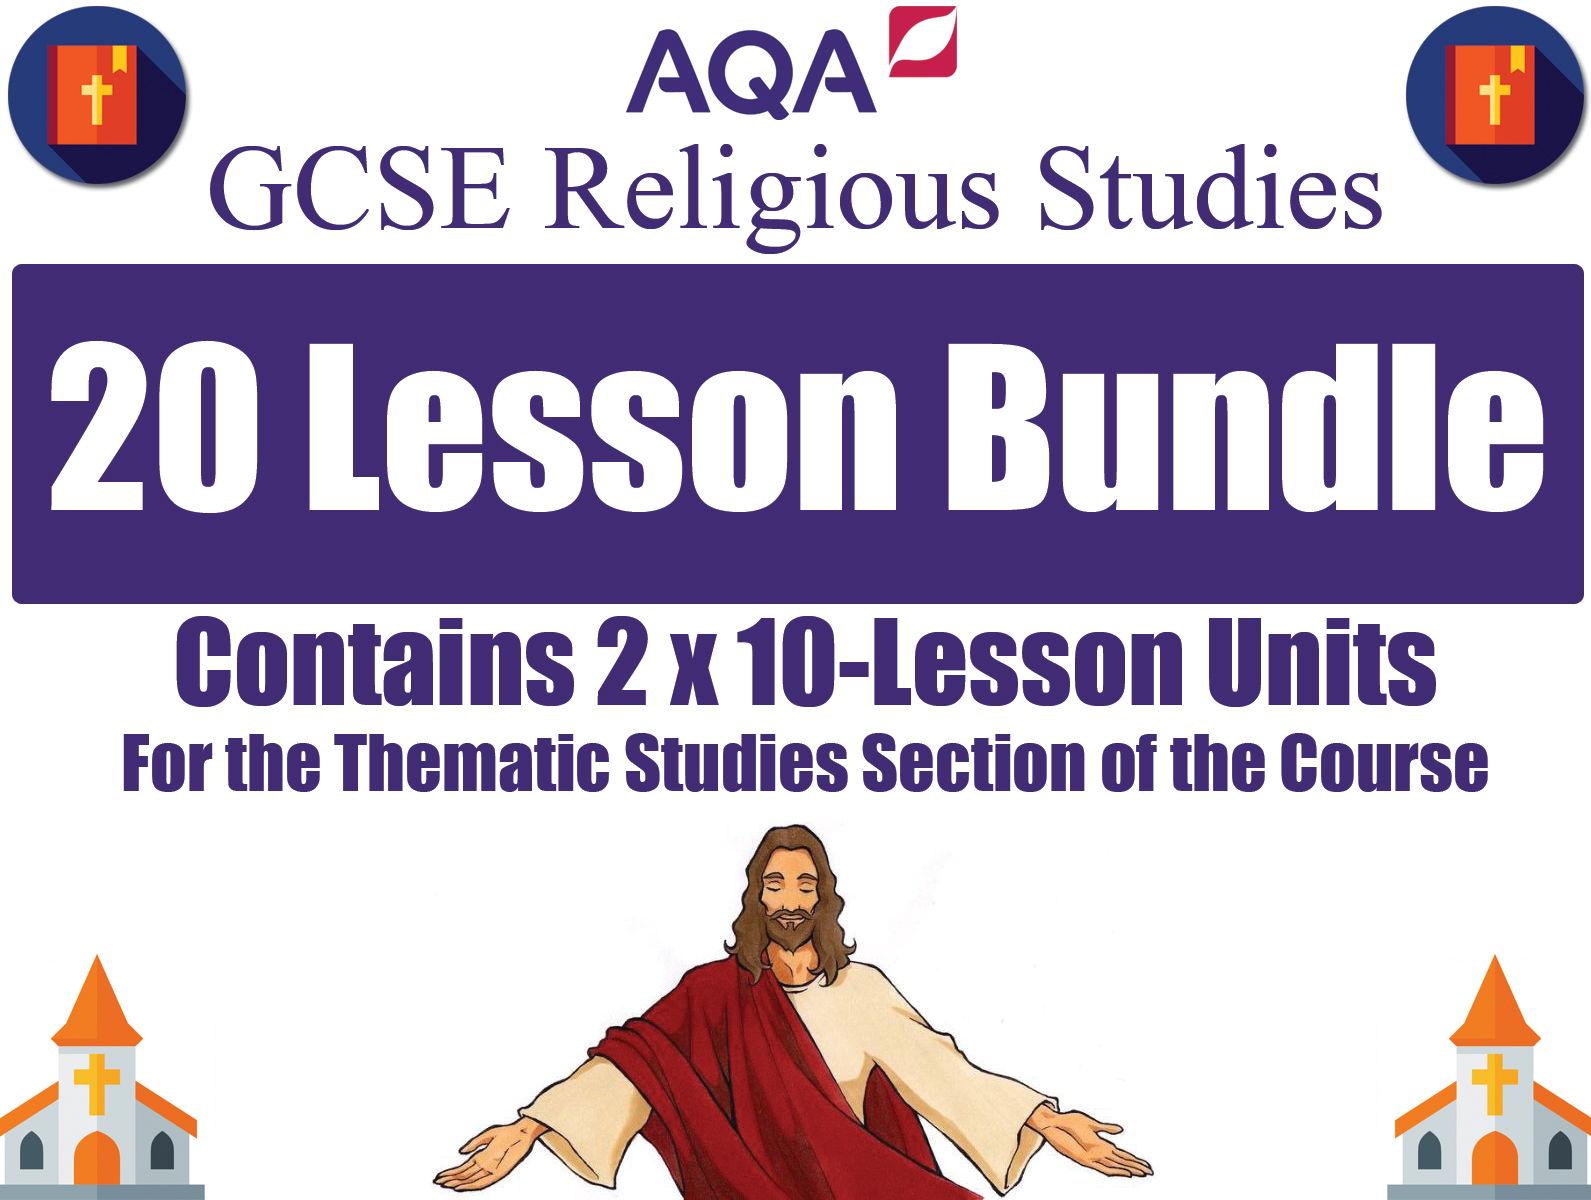 'Relationships & Families' + 'Religion, Crime & Punishment' (20 Lessons) [GCSE RS - AQA]